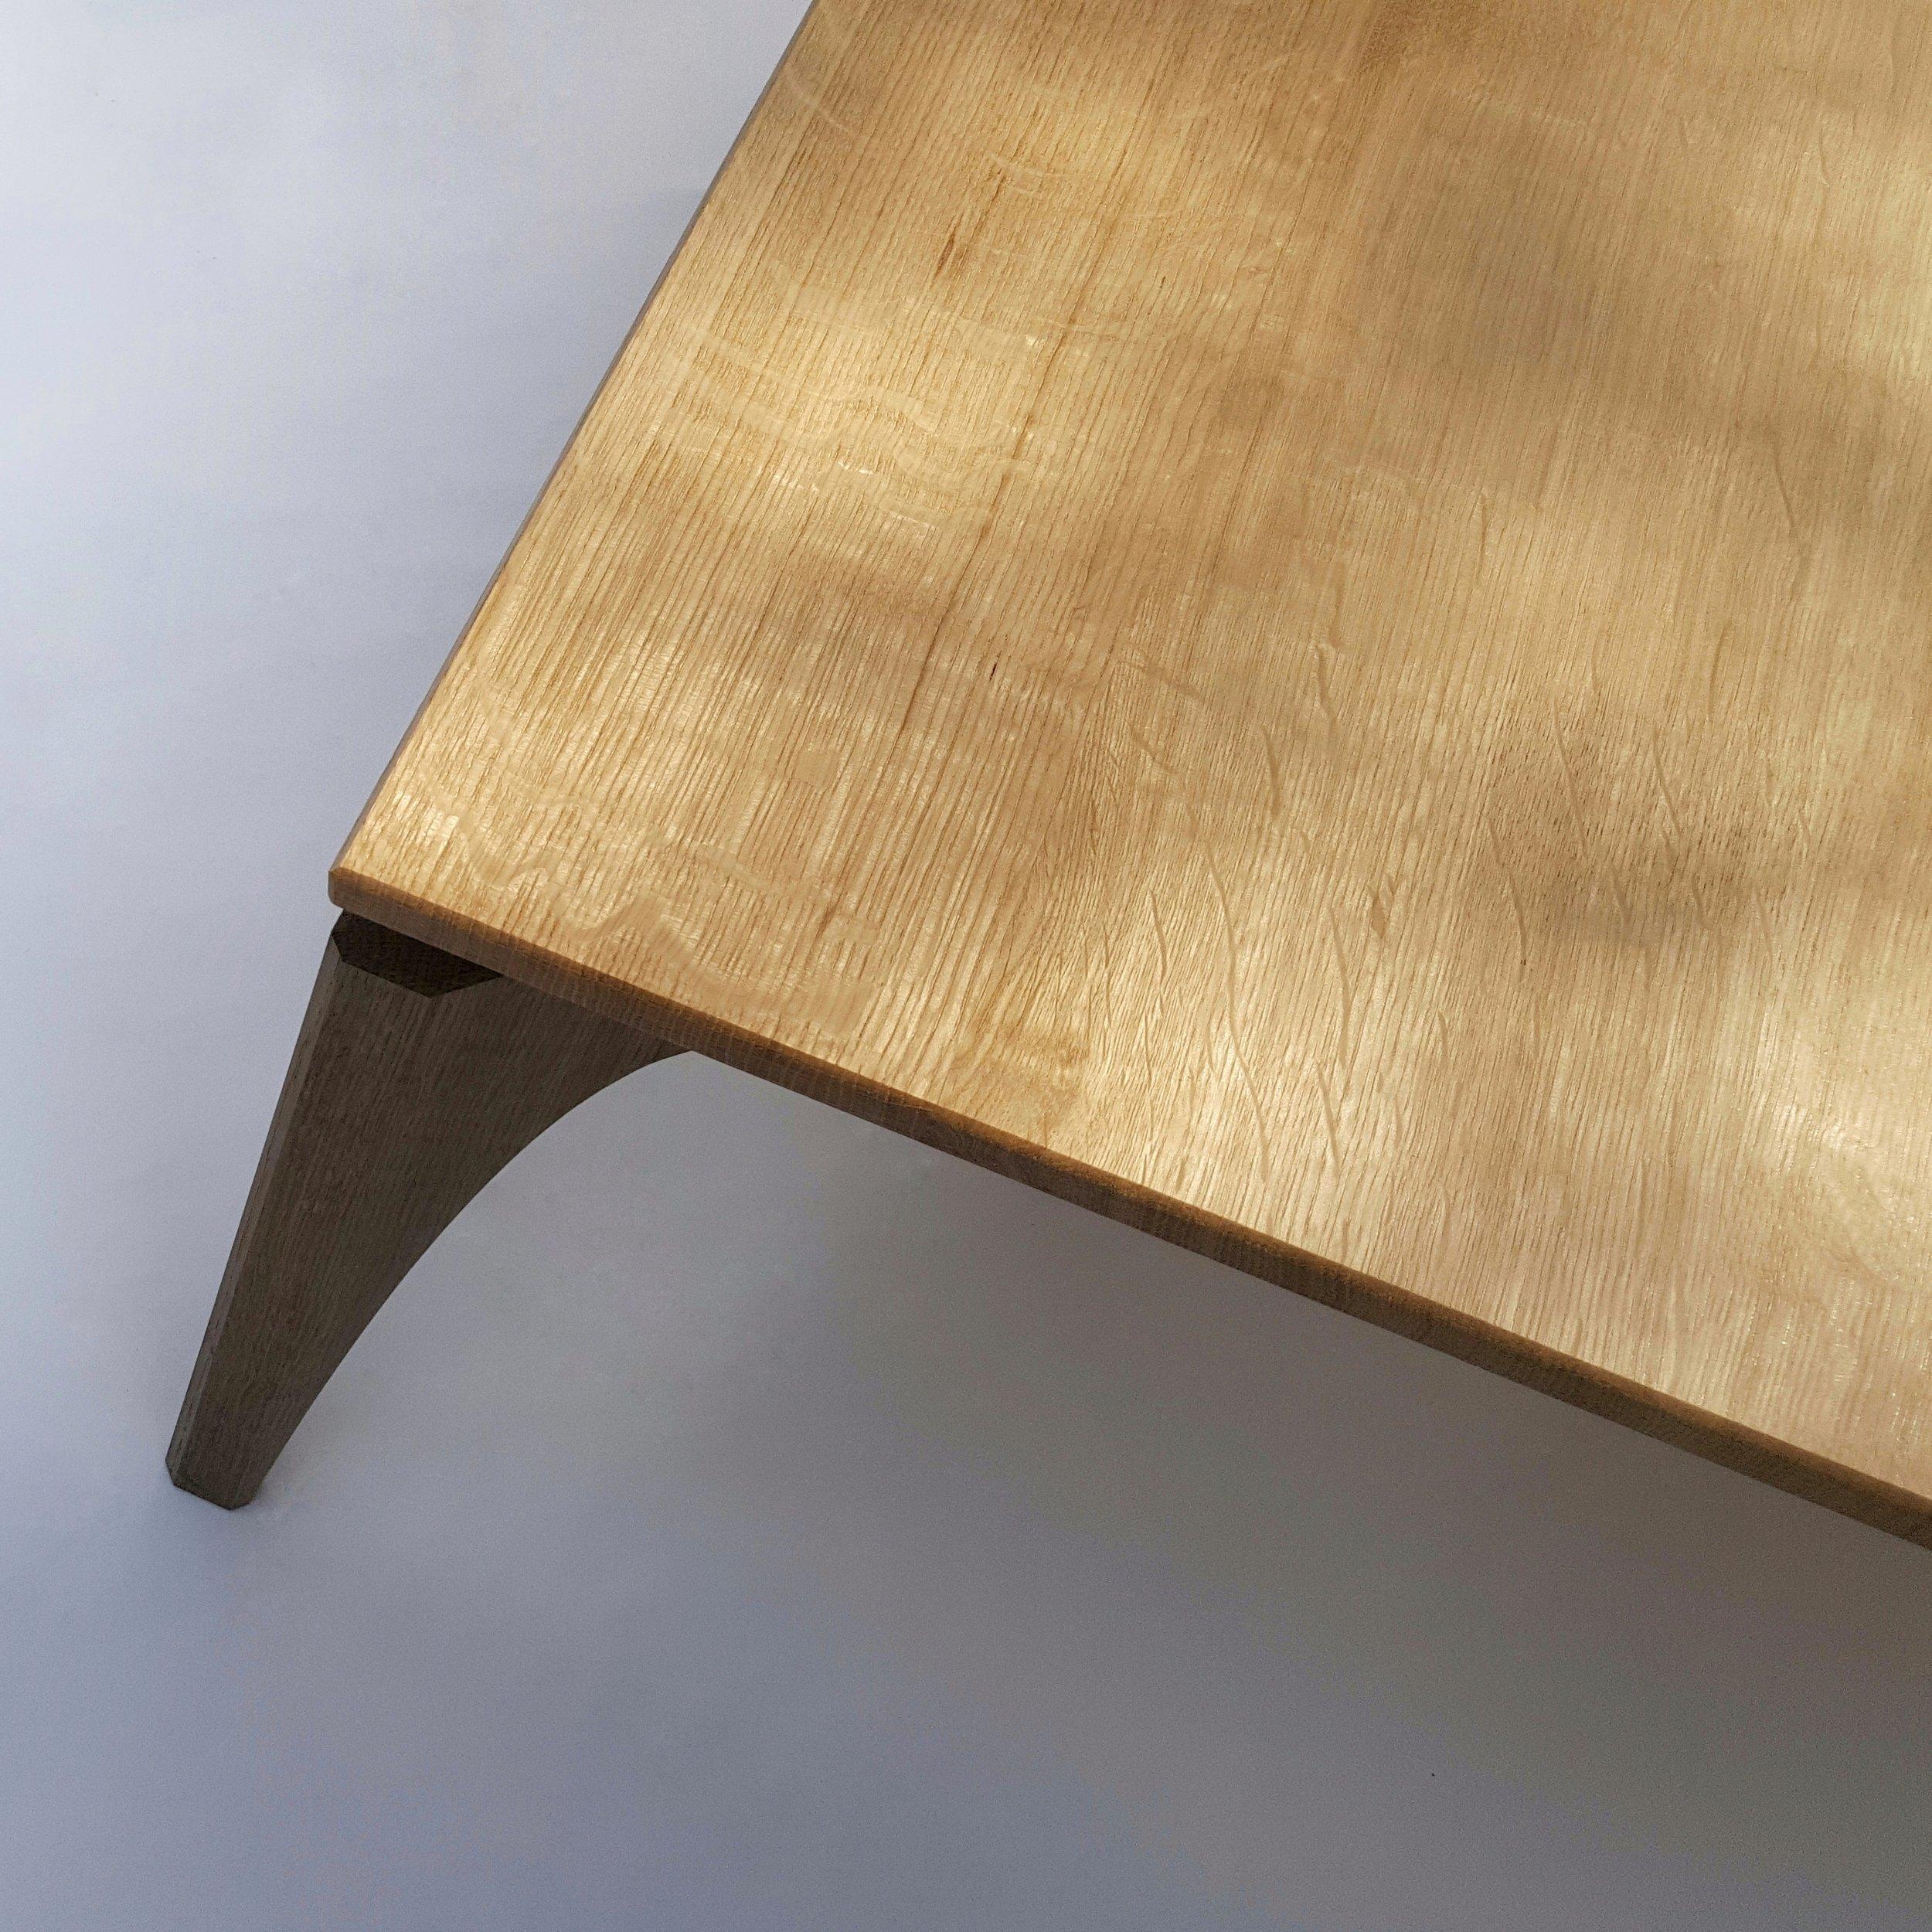 Among trees coffee table 4.jpeg